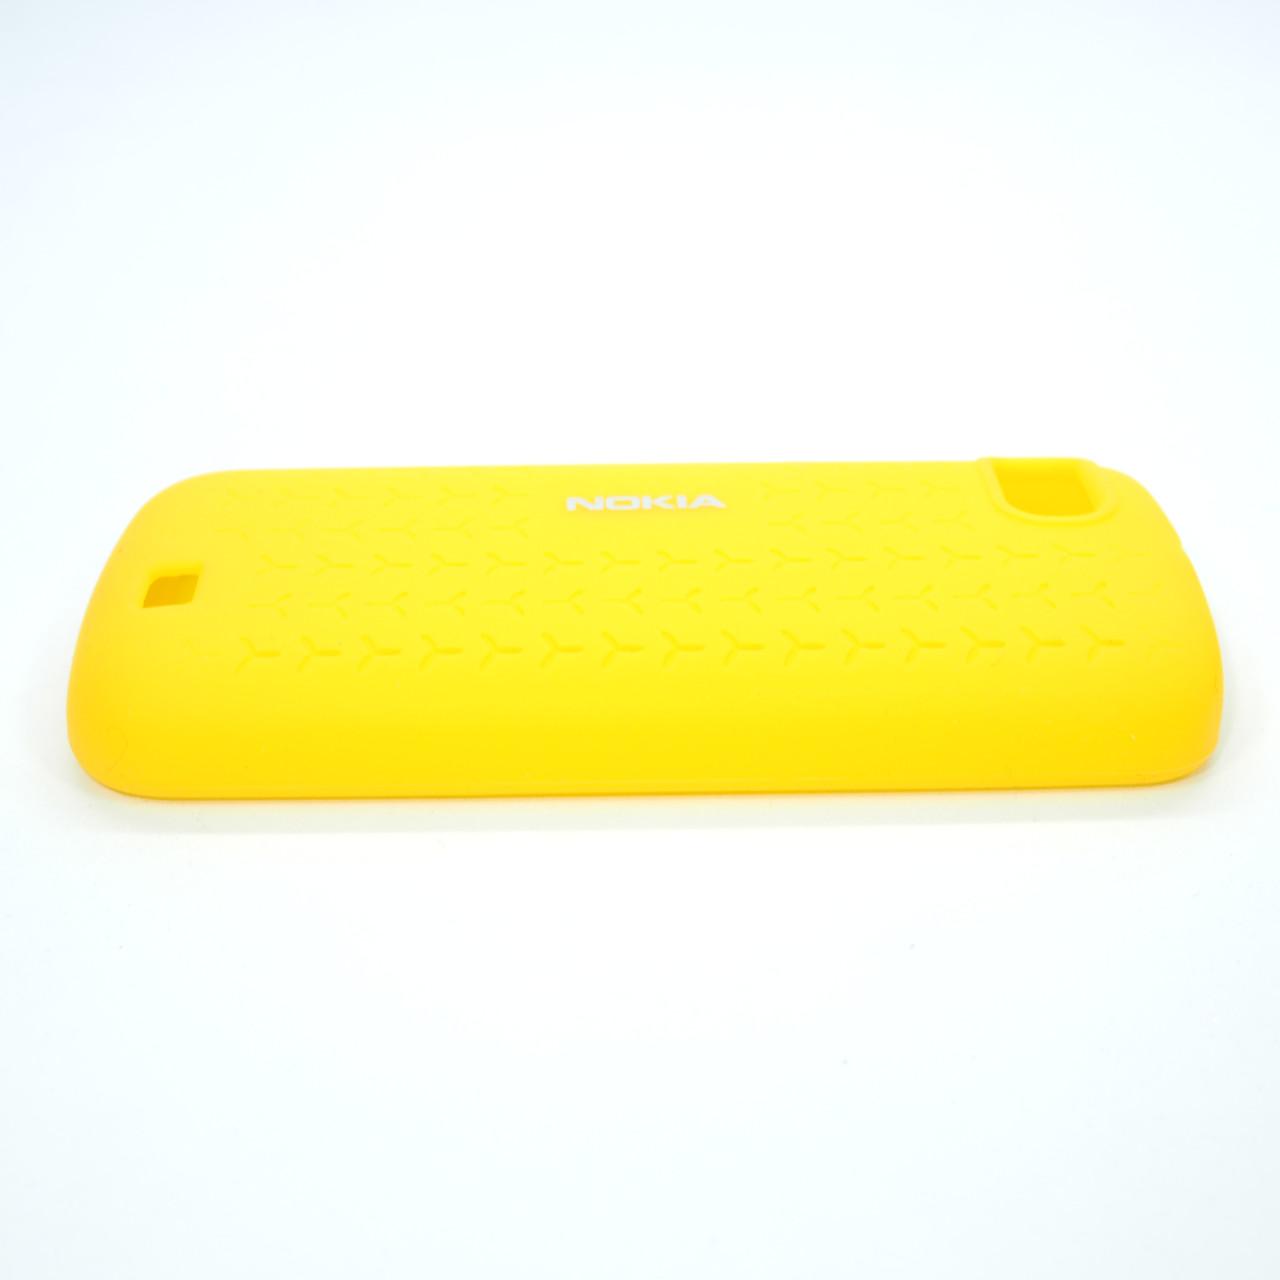 Nokia CC-1014 C3-01 Silicone Cover yellow Для телефона